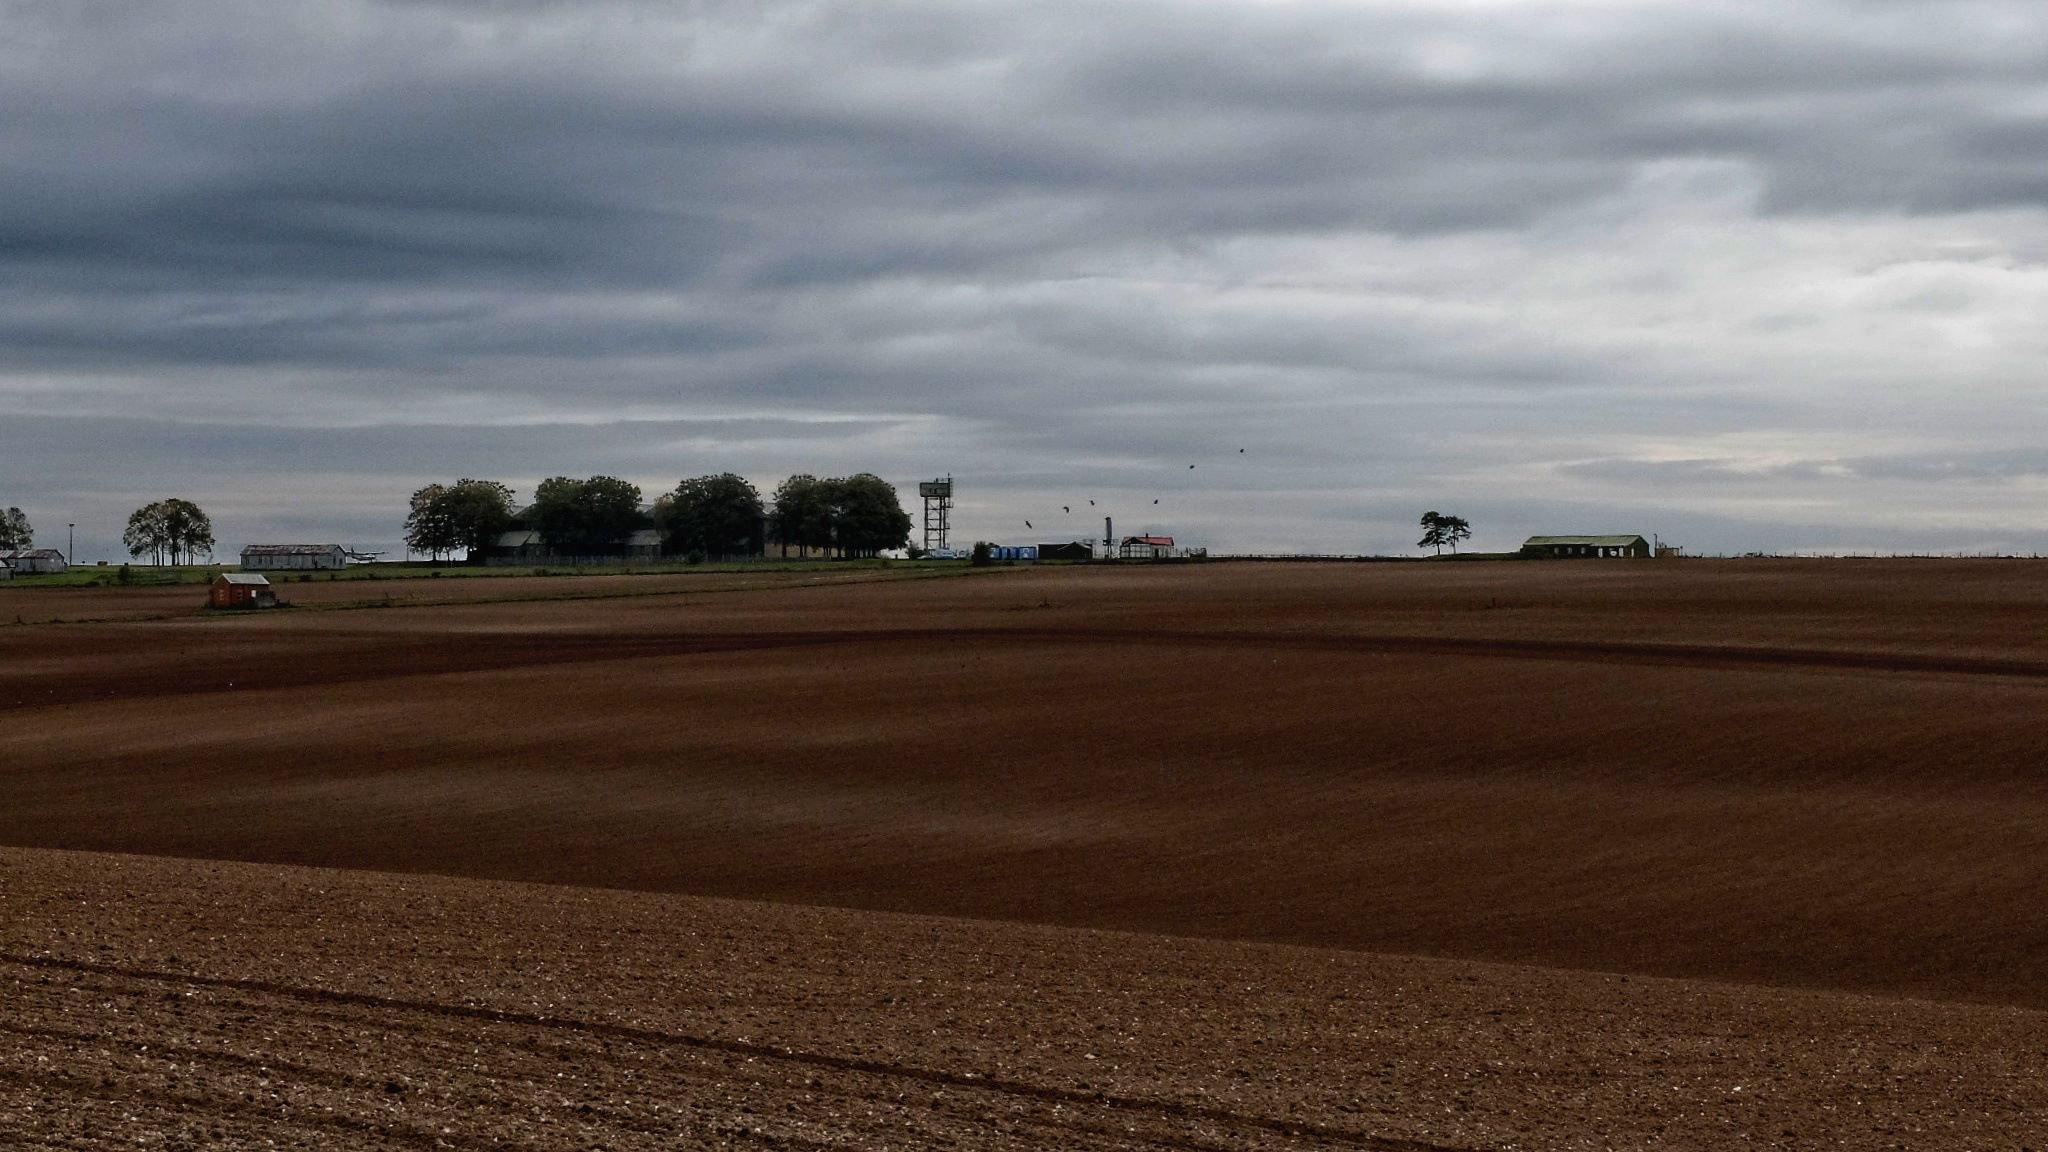 Velvet Fields - Everleigh Airfield by Keith Patrak